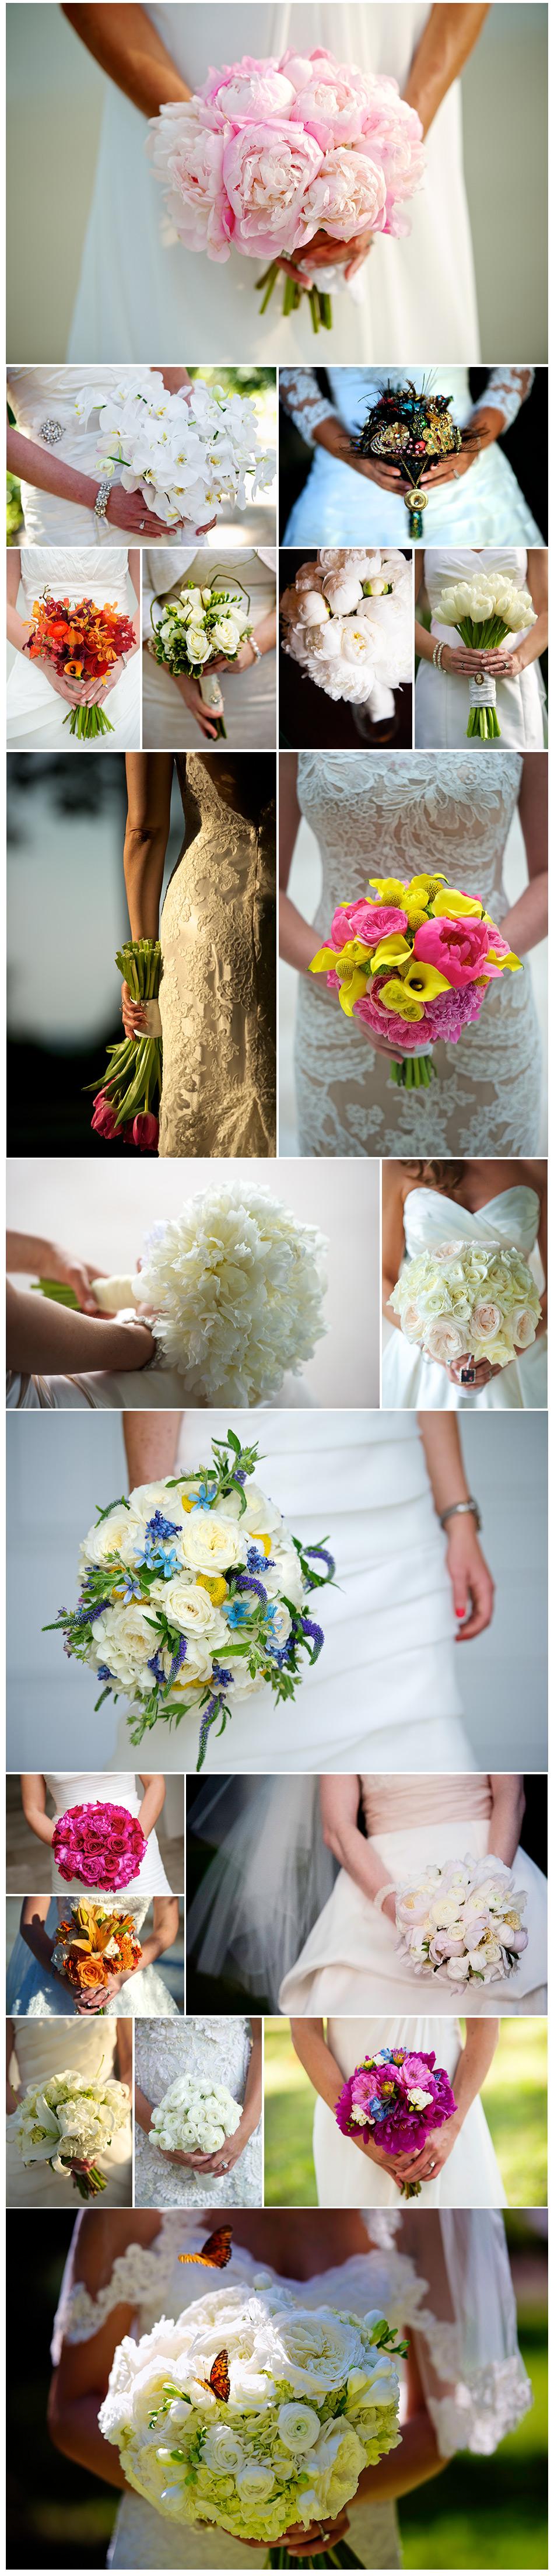 Wedding Day Bouquets | Savannah Wedding Photographer | Hilton Head Wedding Photographer | Sea Island Wedding Photographer